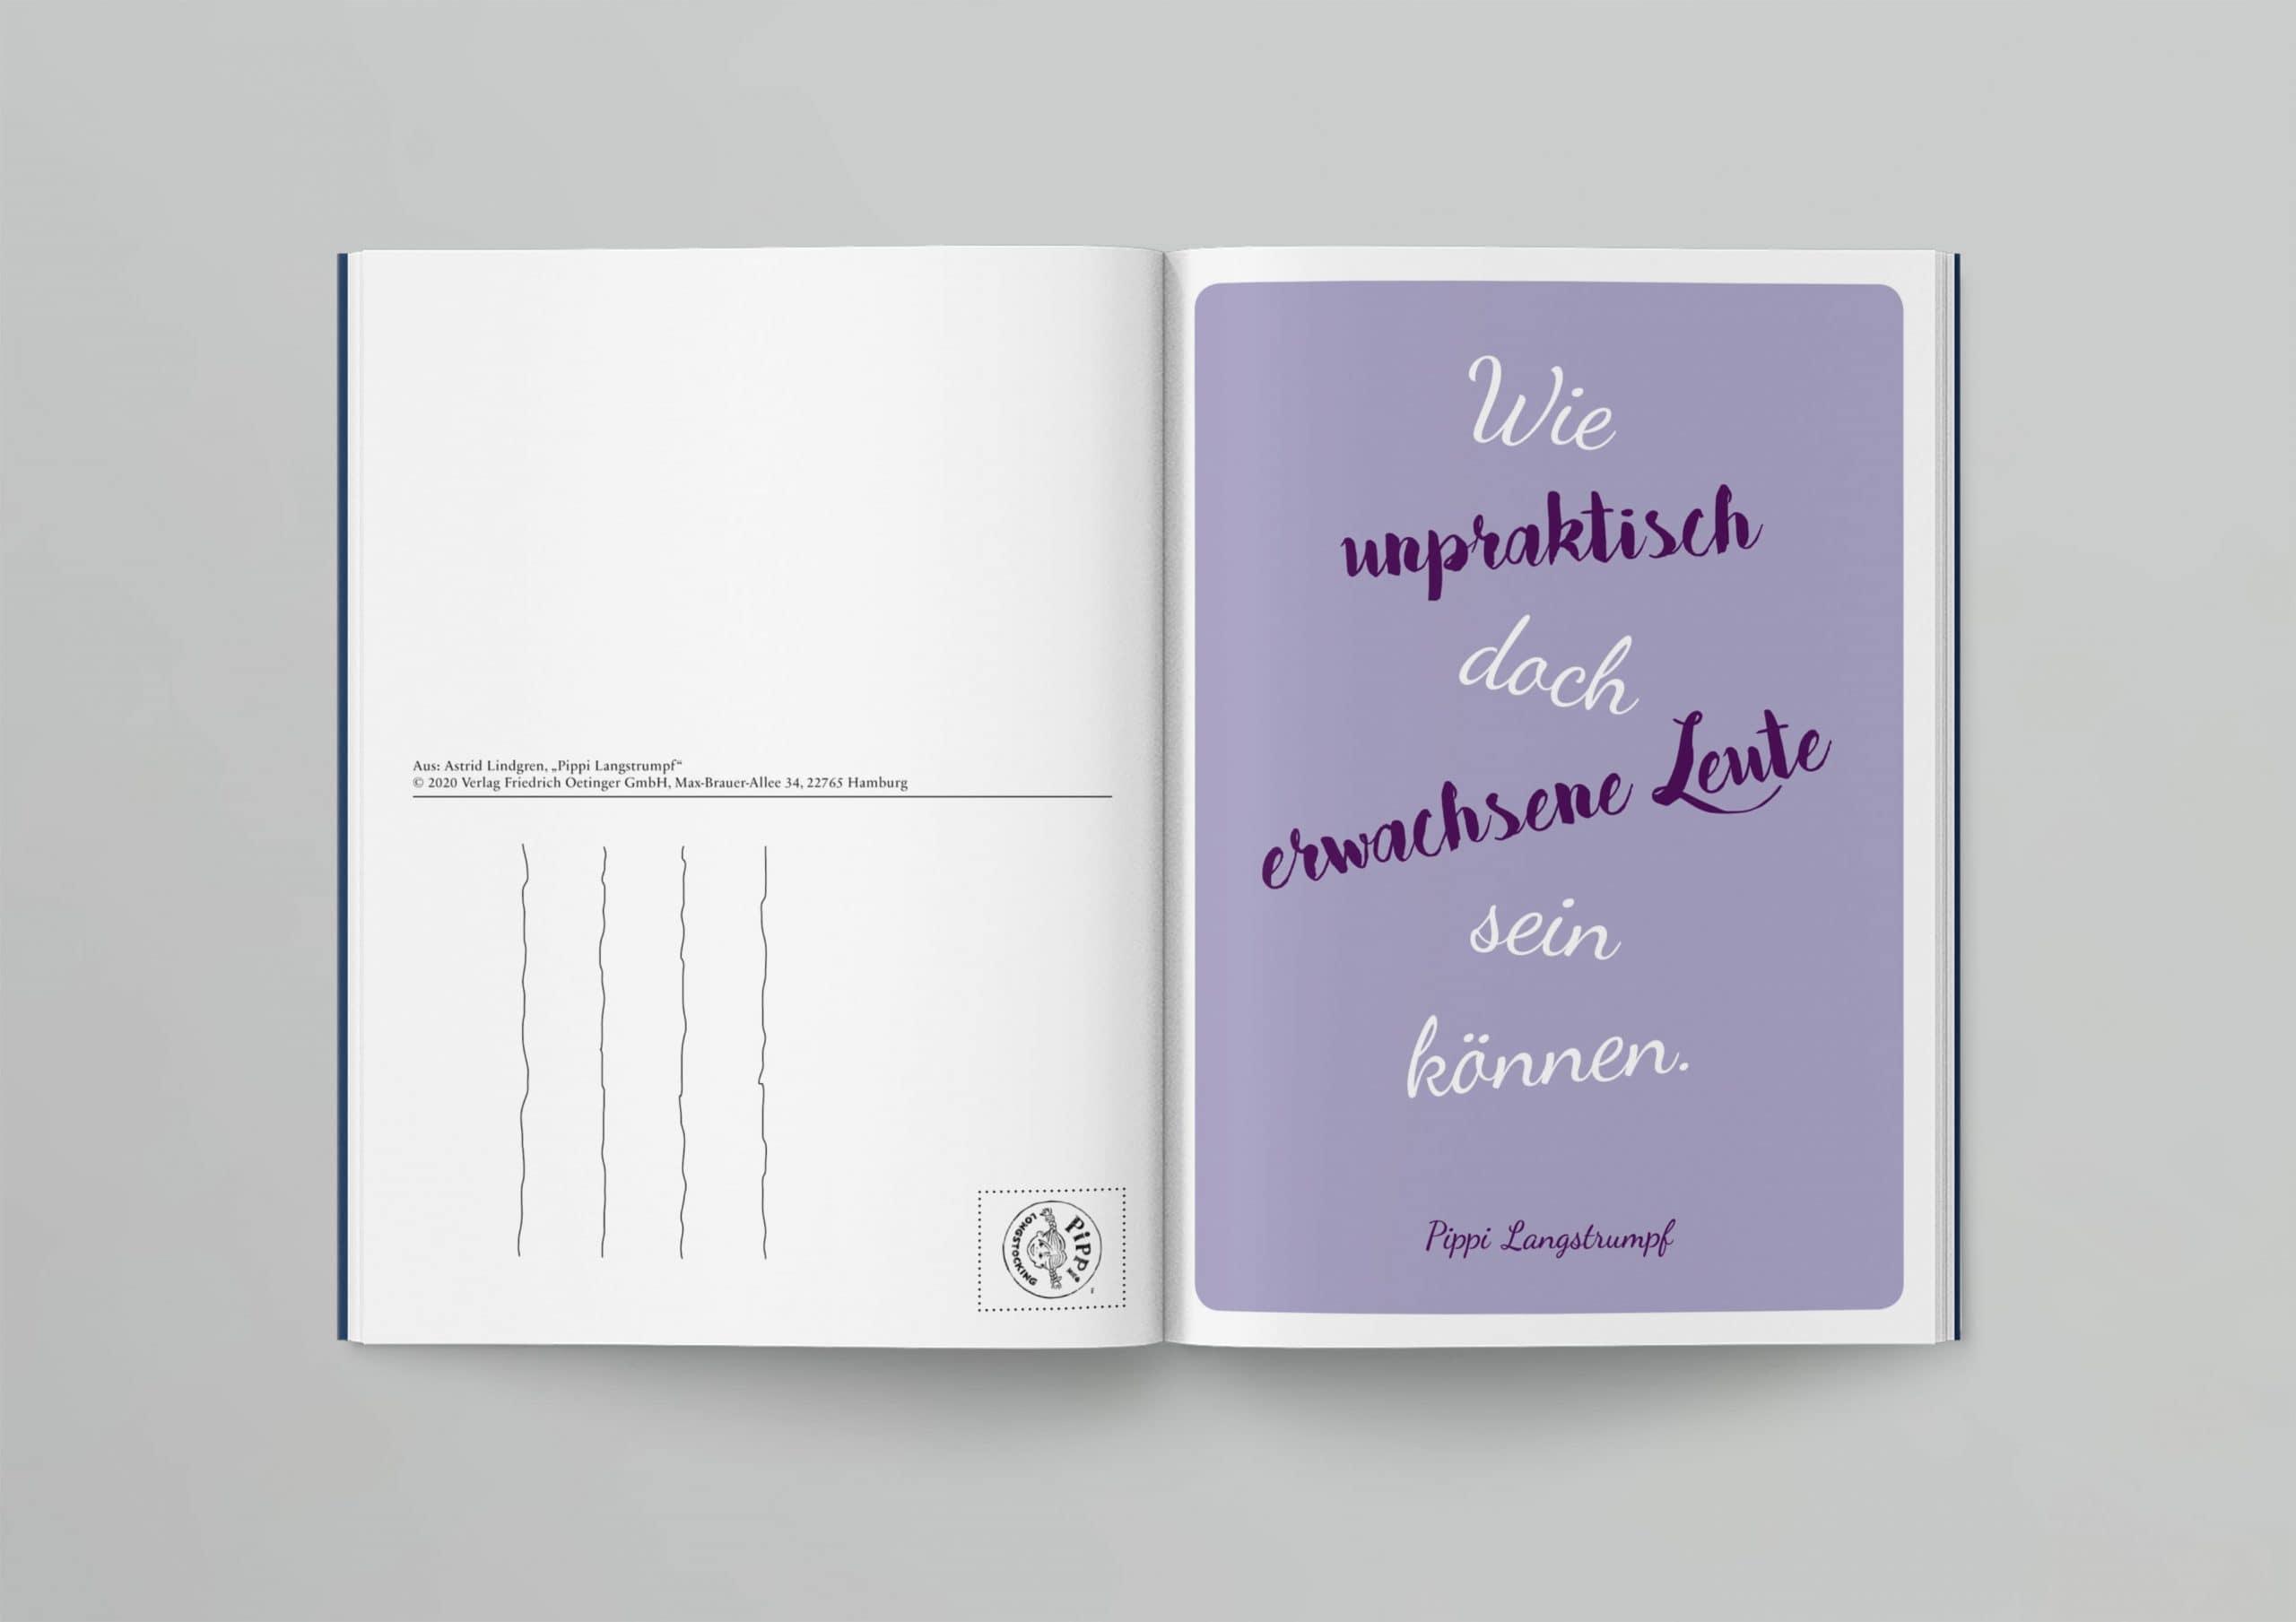 Oetinger-Pippi-Langstrumpf-Postkarten-IN03